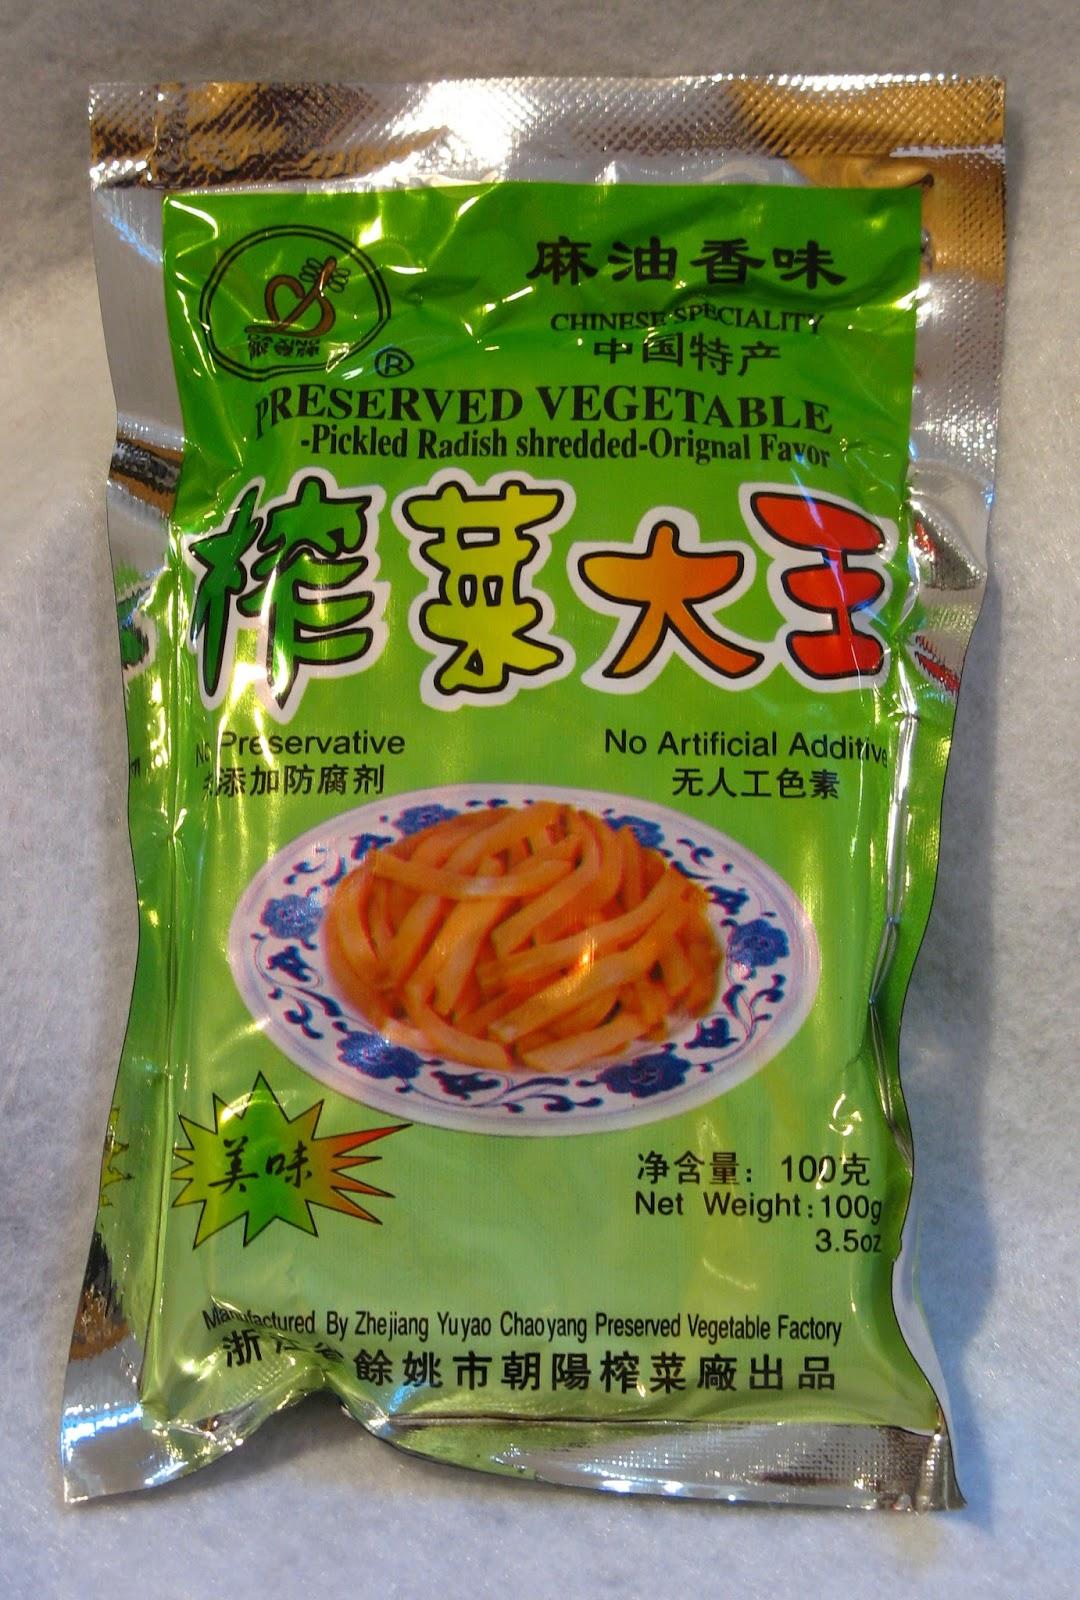 Daxing Brand Shredded Picked Radish (榨菜大王, zaa3 zoi3 daai6 ...